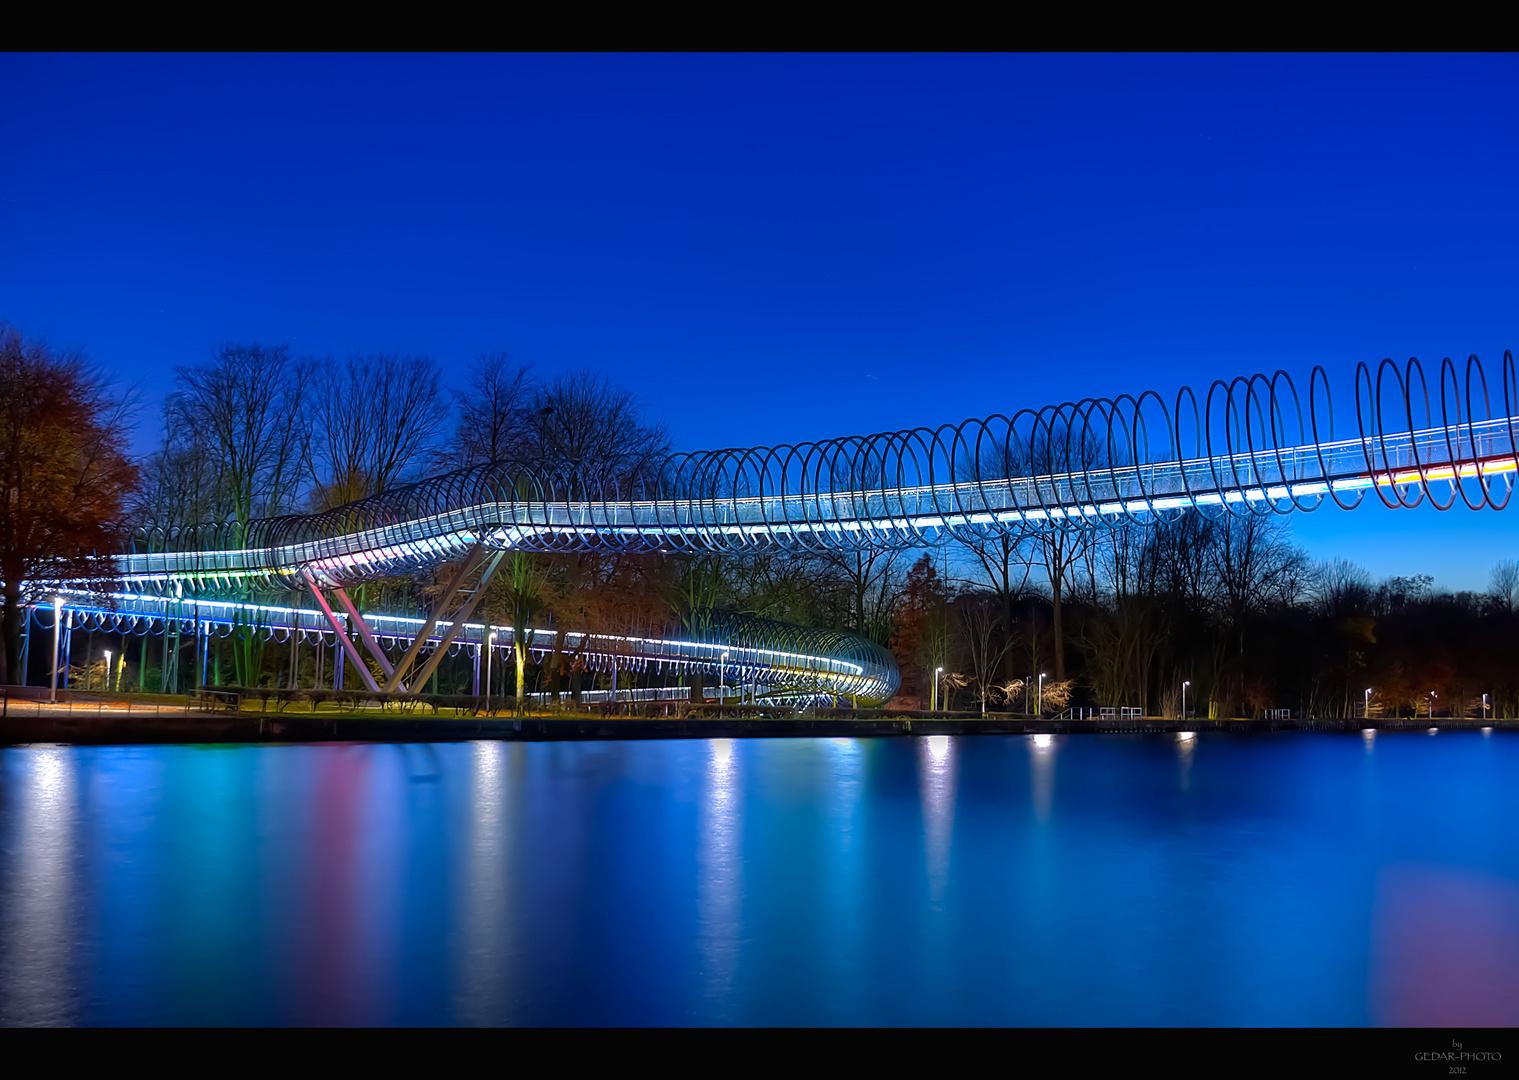 Rehberger Brücke Oberhausen